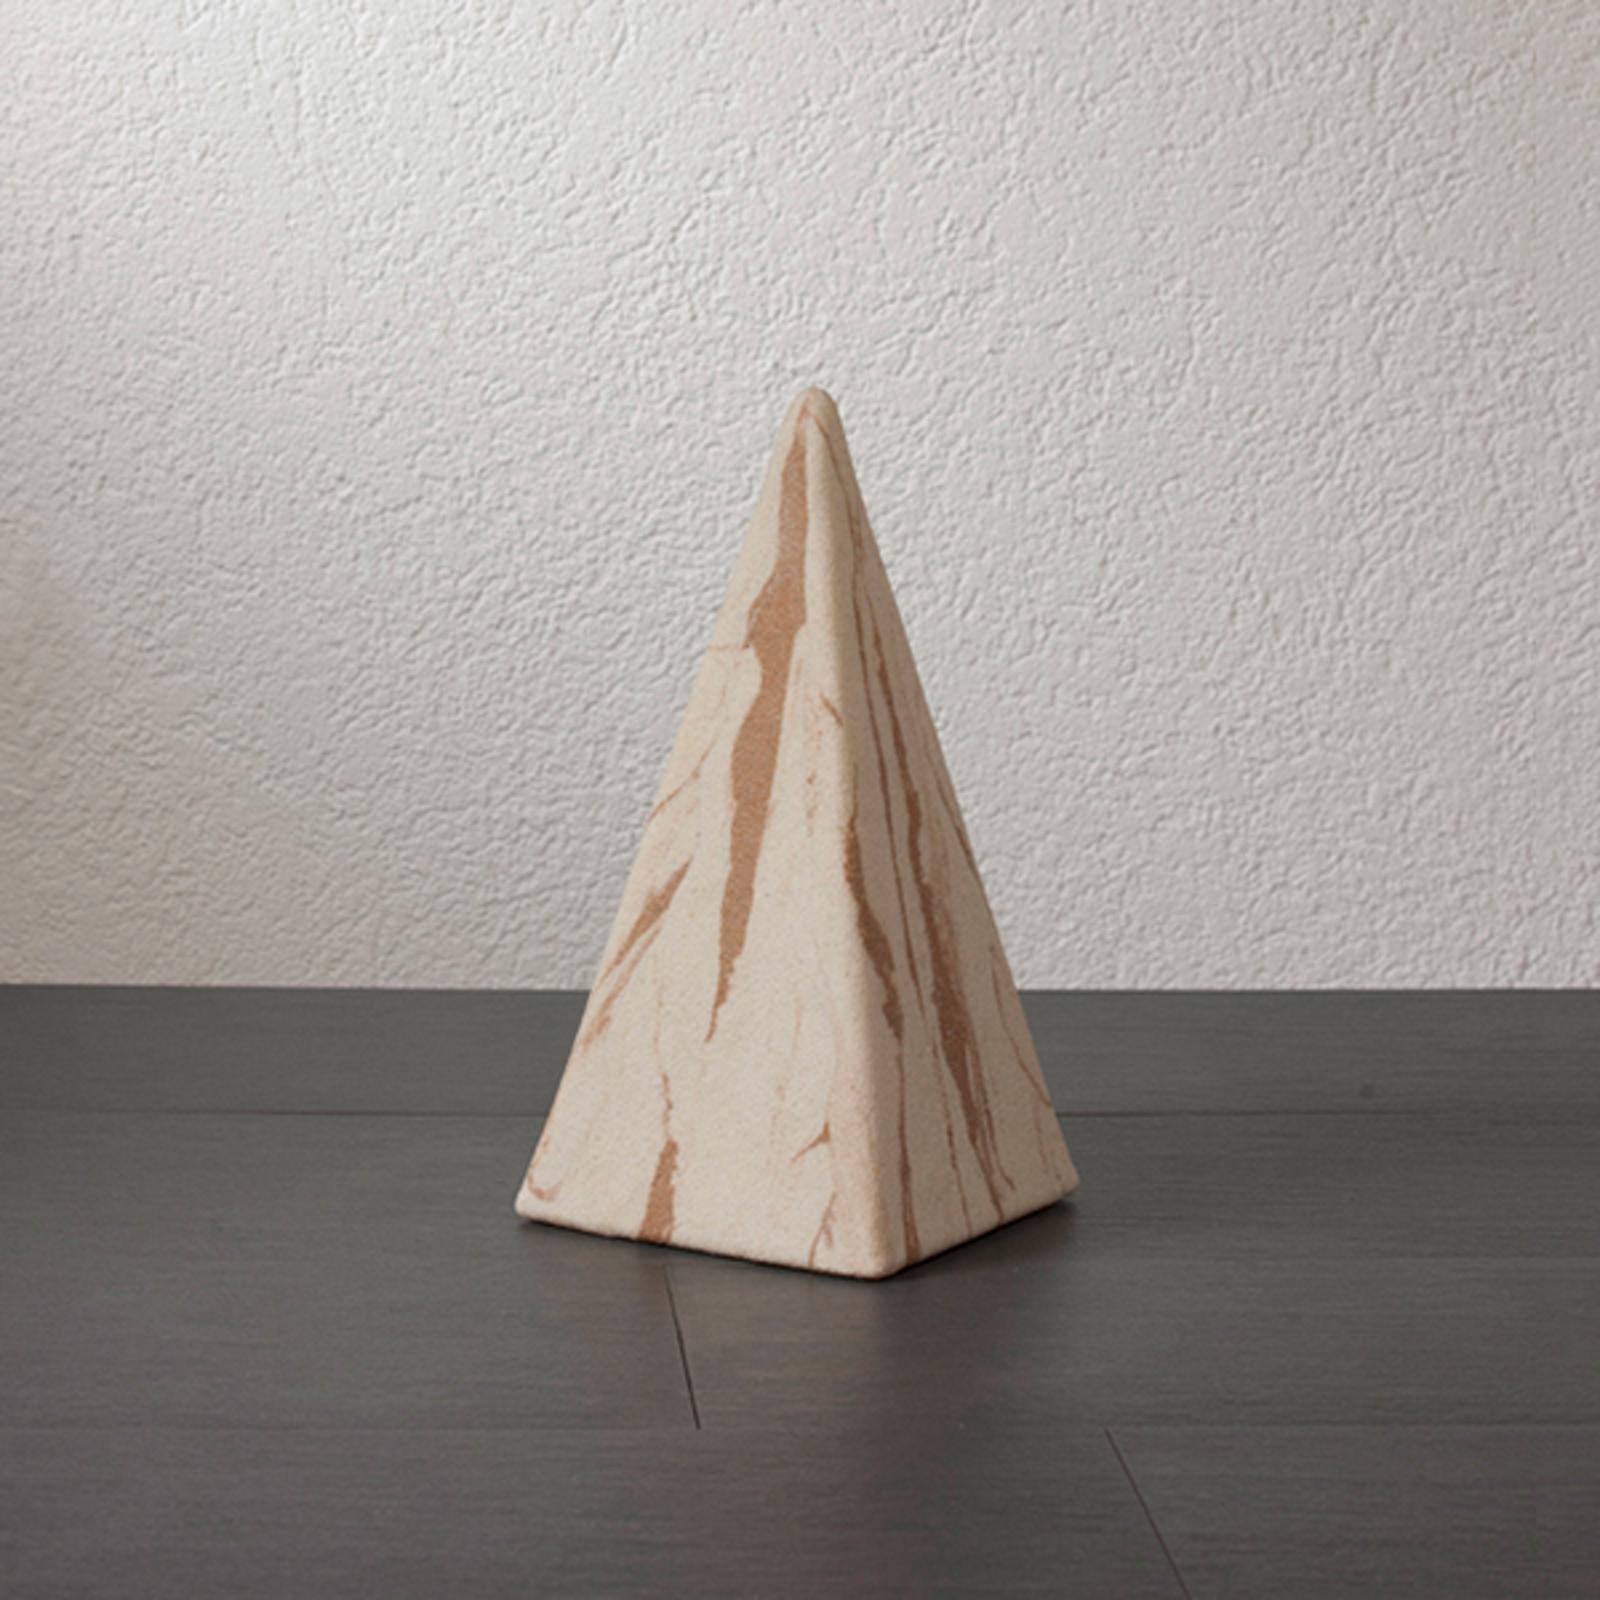 Piramide Sahara 36cm met rubber aansluiting